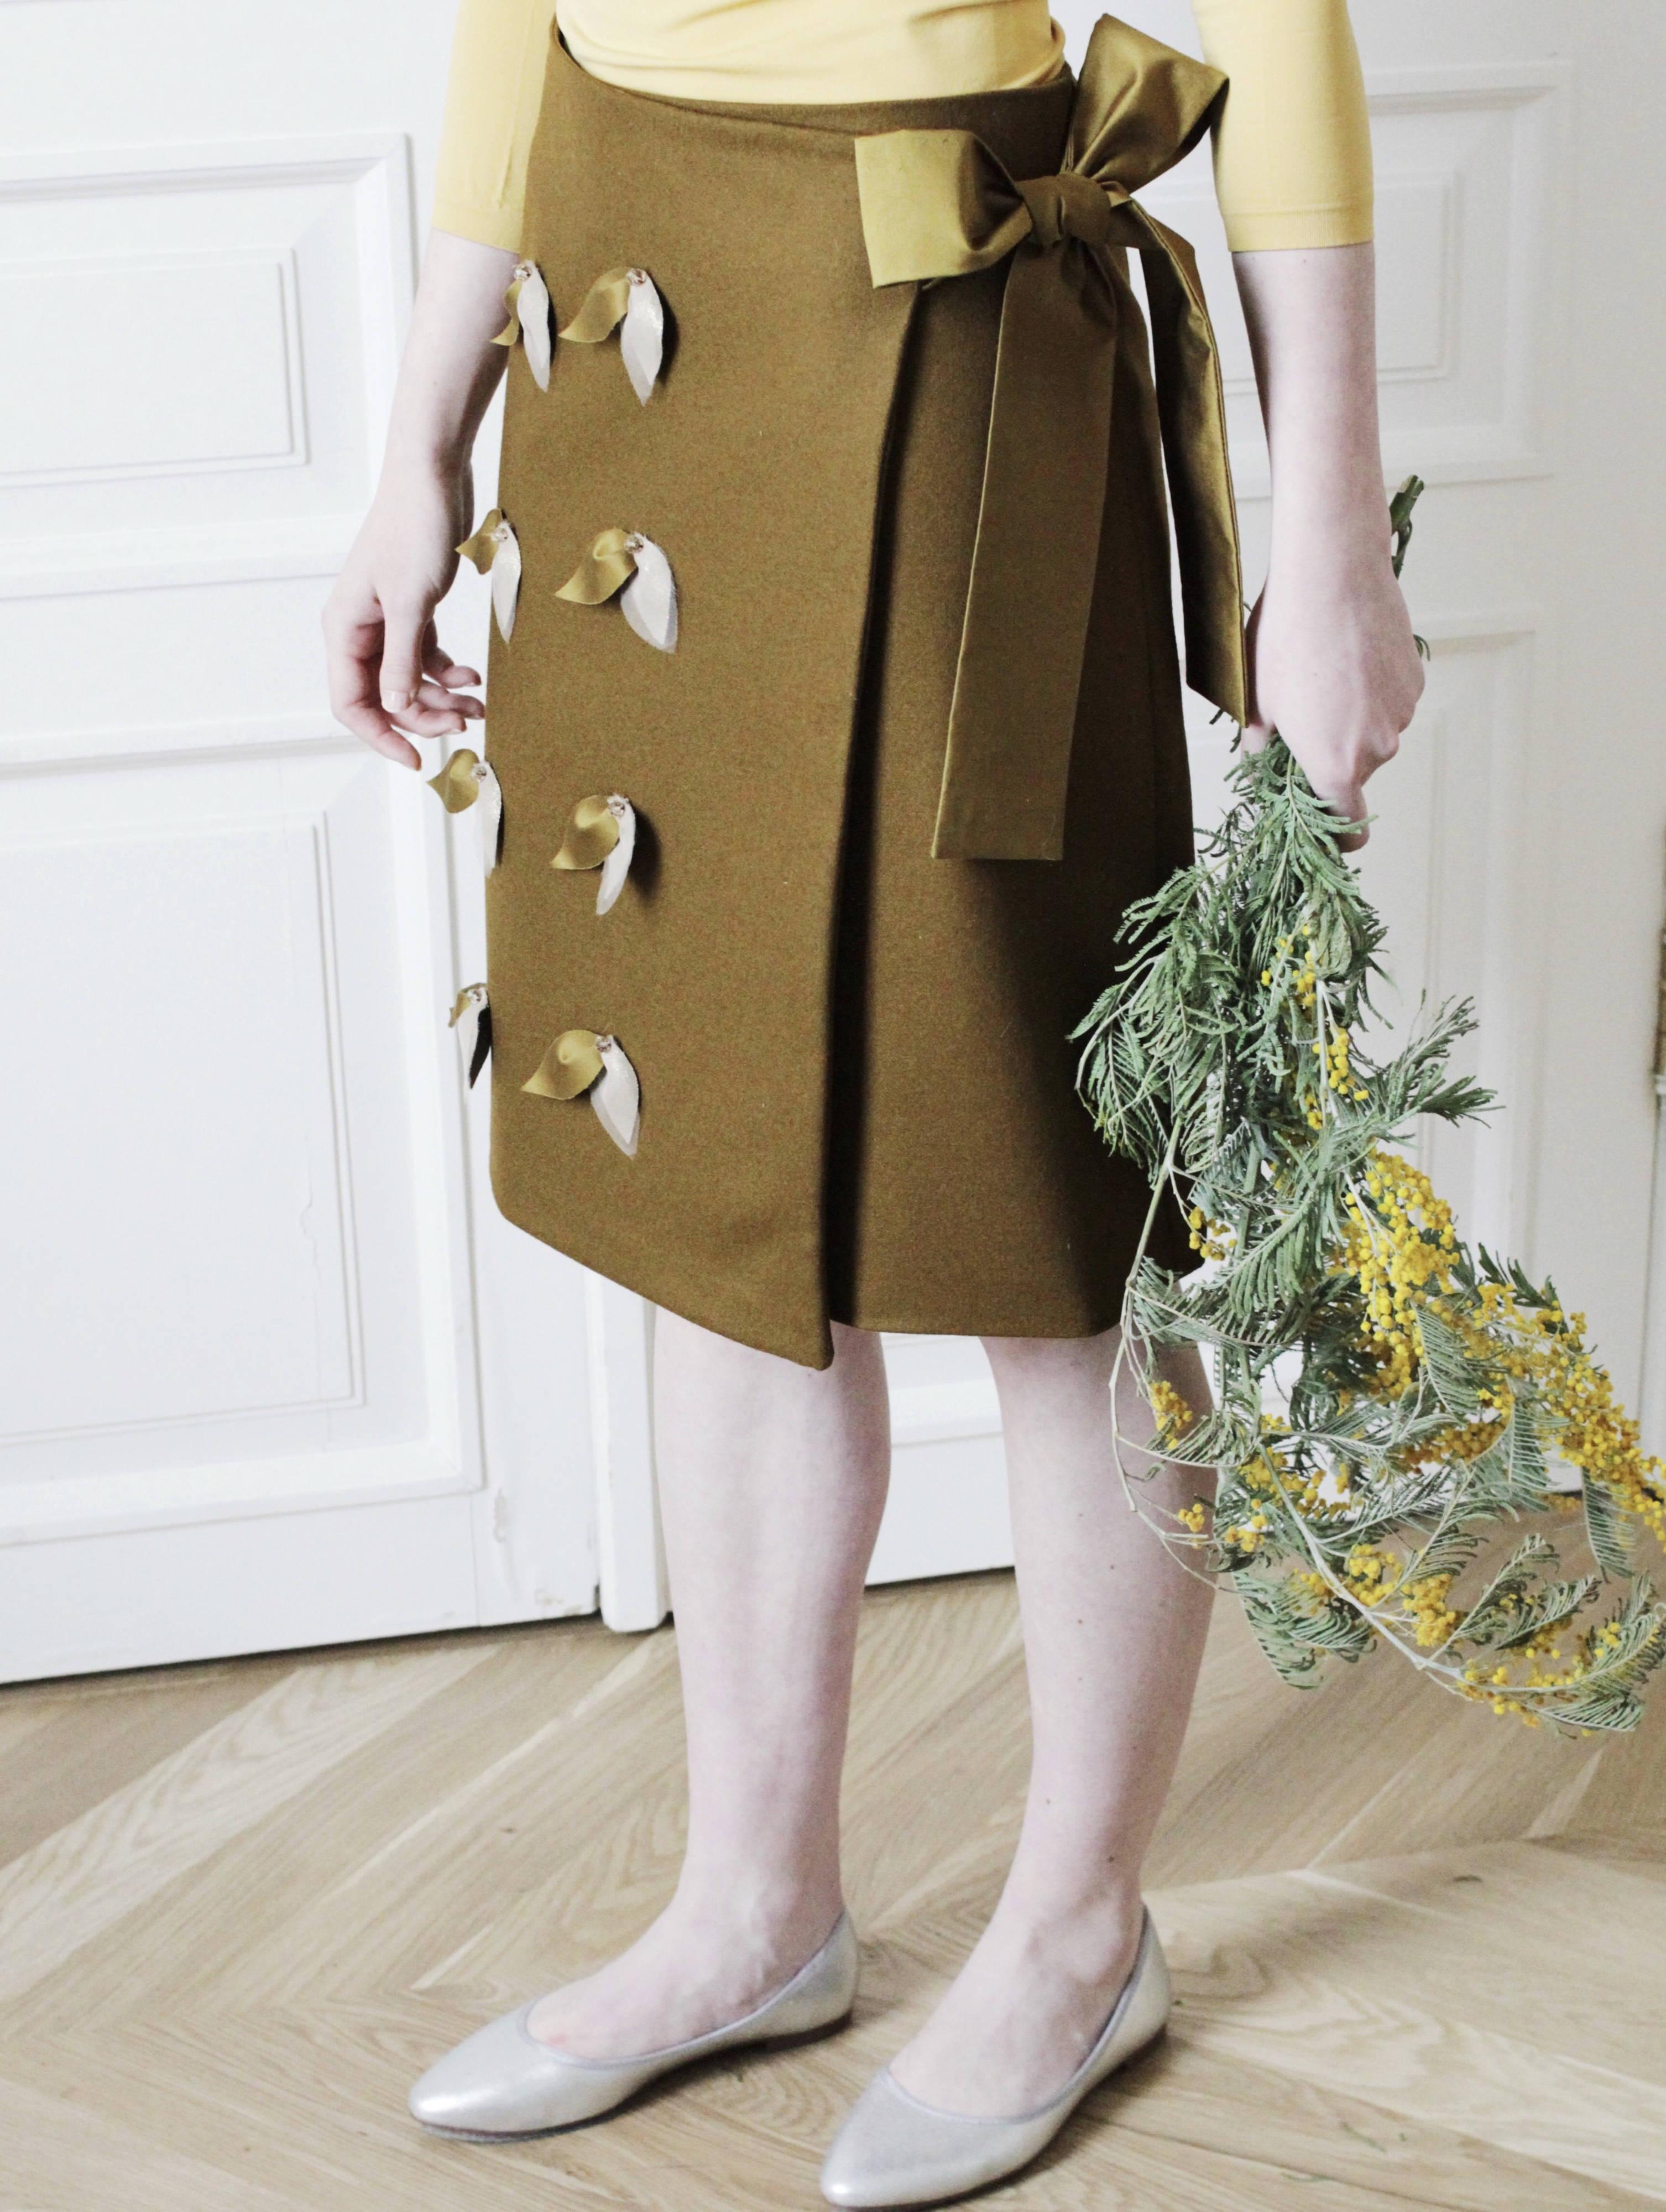 dc18c52068b Юбка с запахом в магазине «Losi.Losi.Couture» на Ламбада-маркете